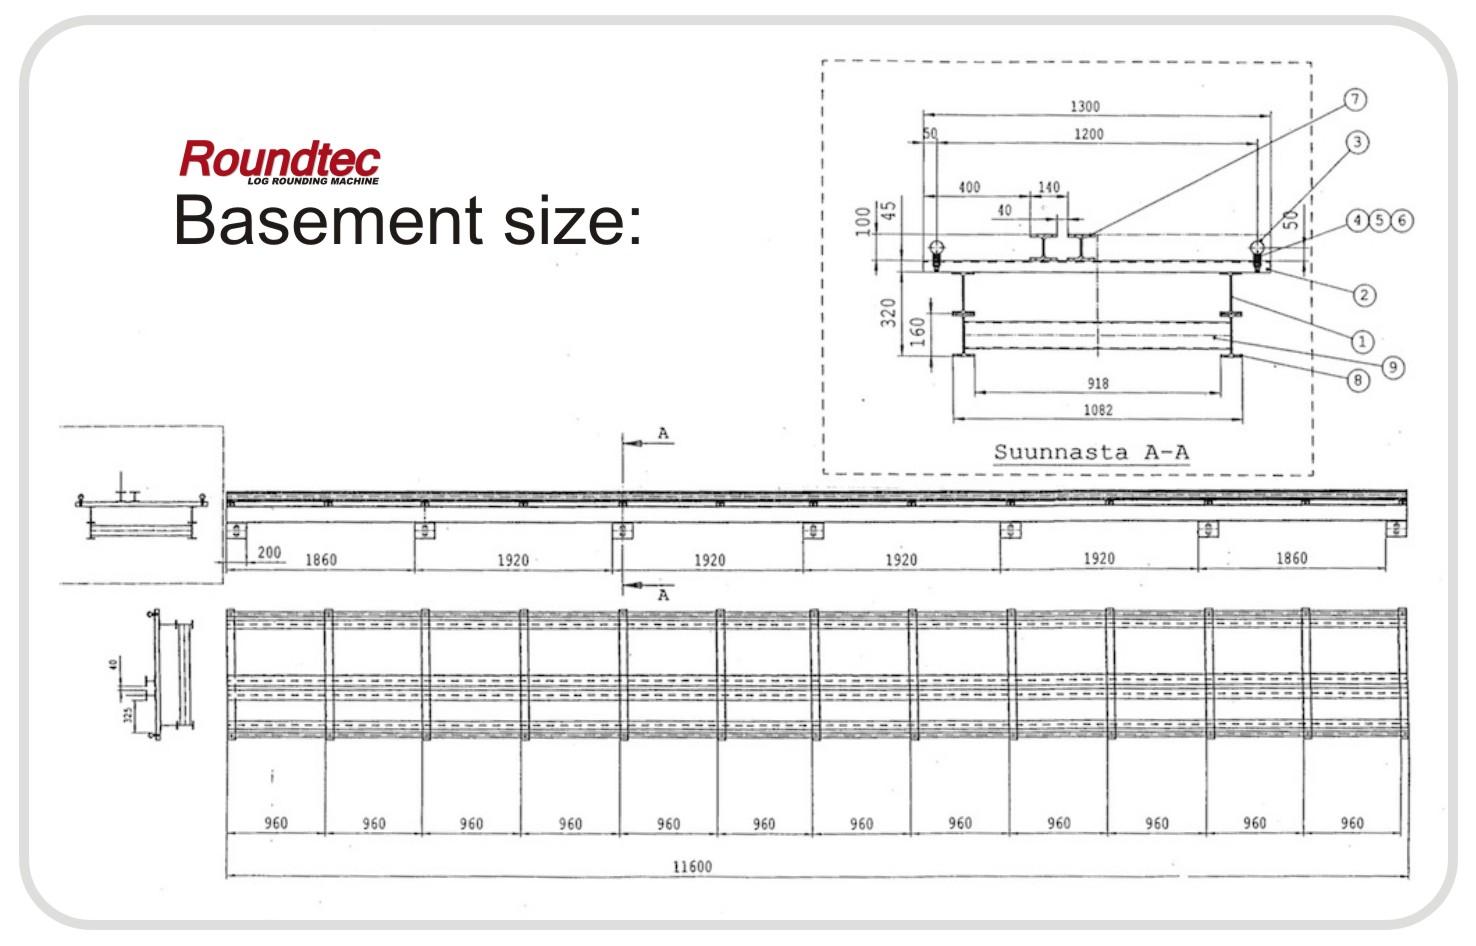 Roundtec basement size